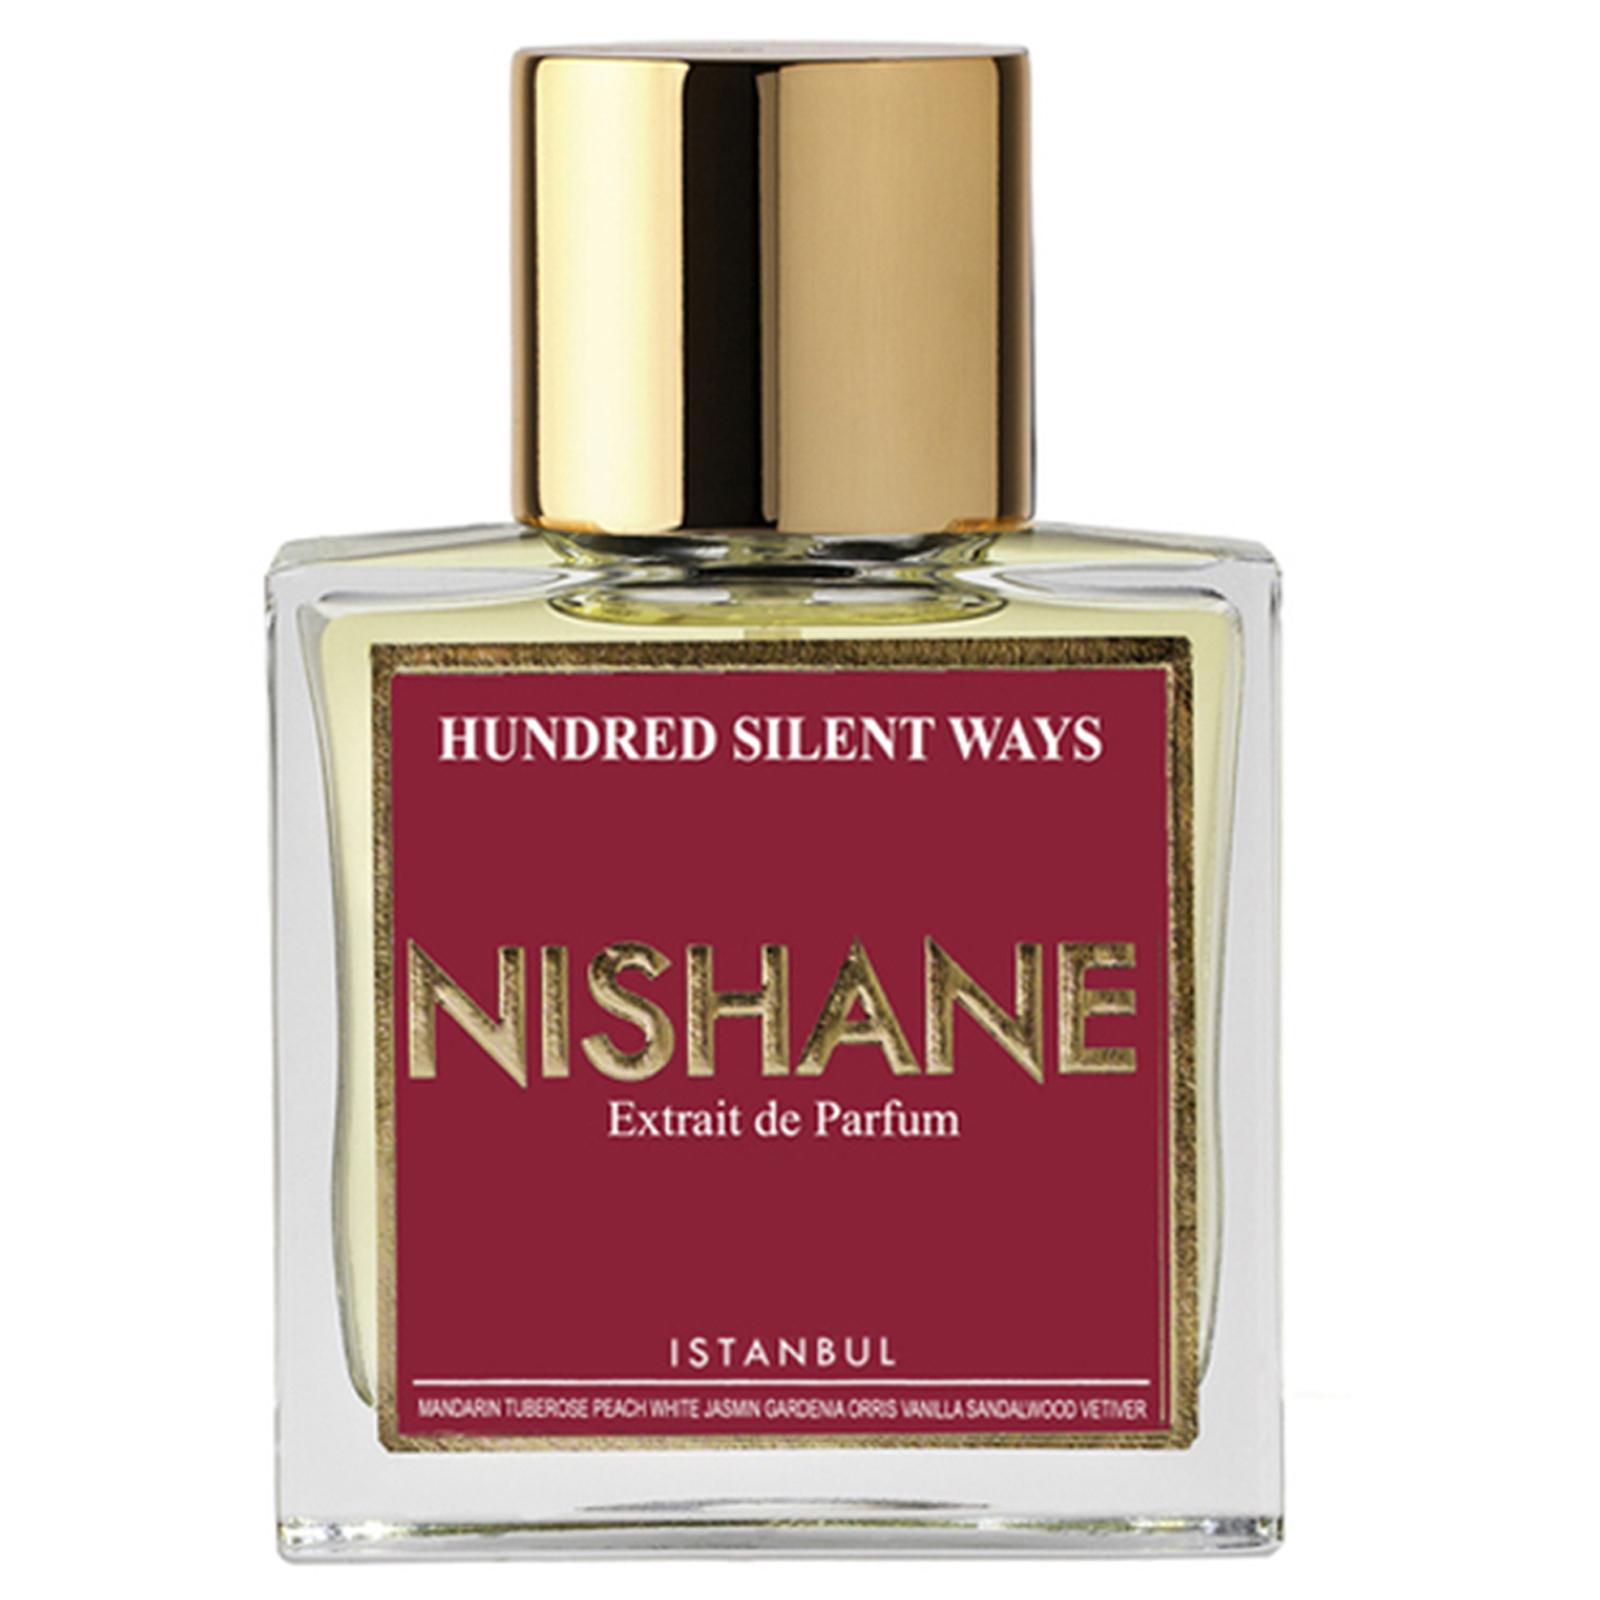 Hundred silent ways extrait de parfum 50 ml